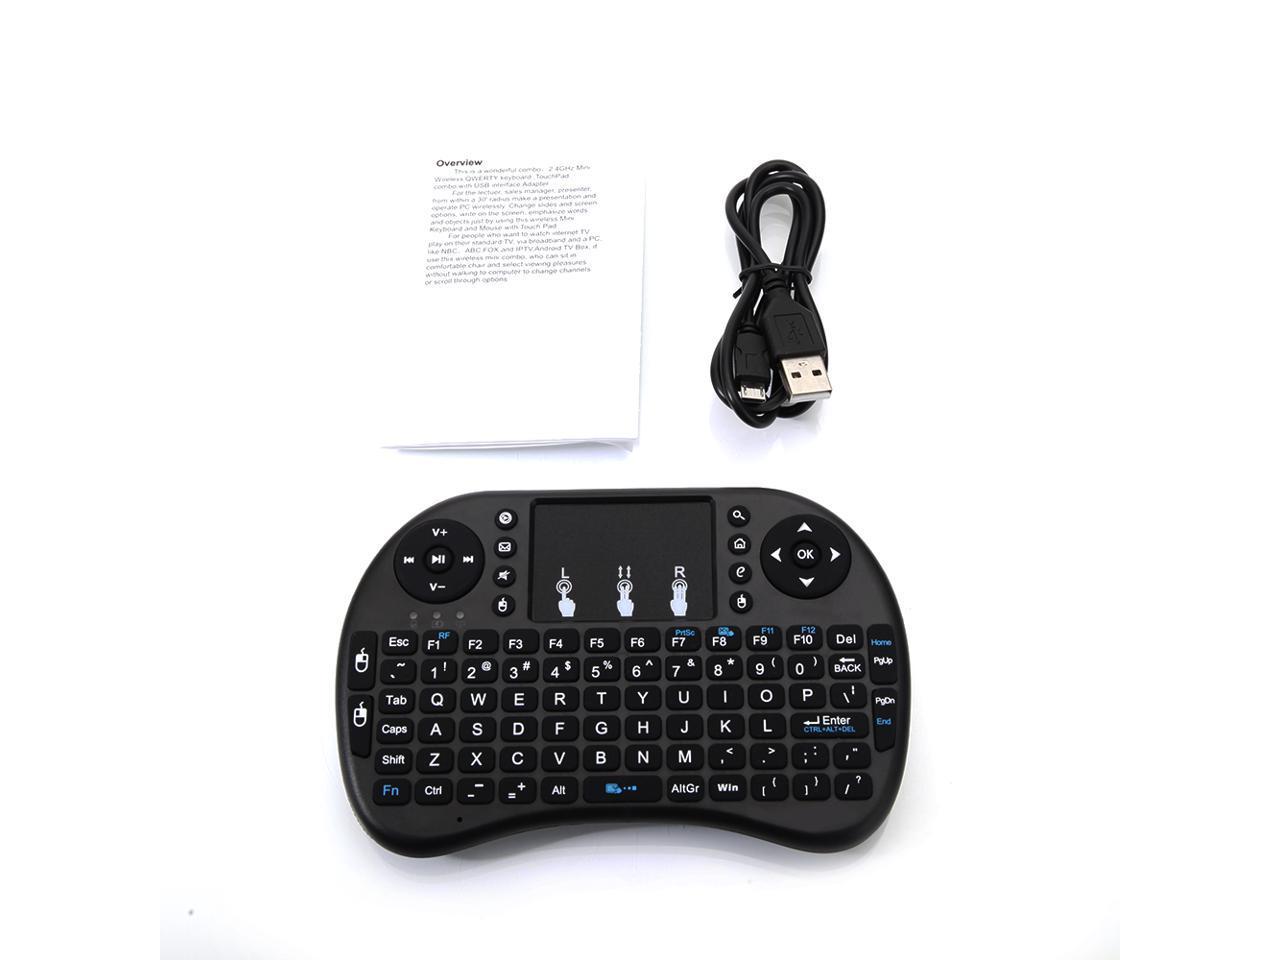 Mini 2.4GHz Wireless Keyboard with Touchpad